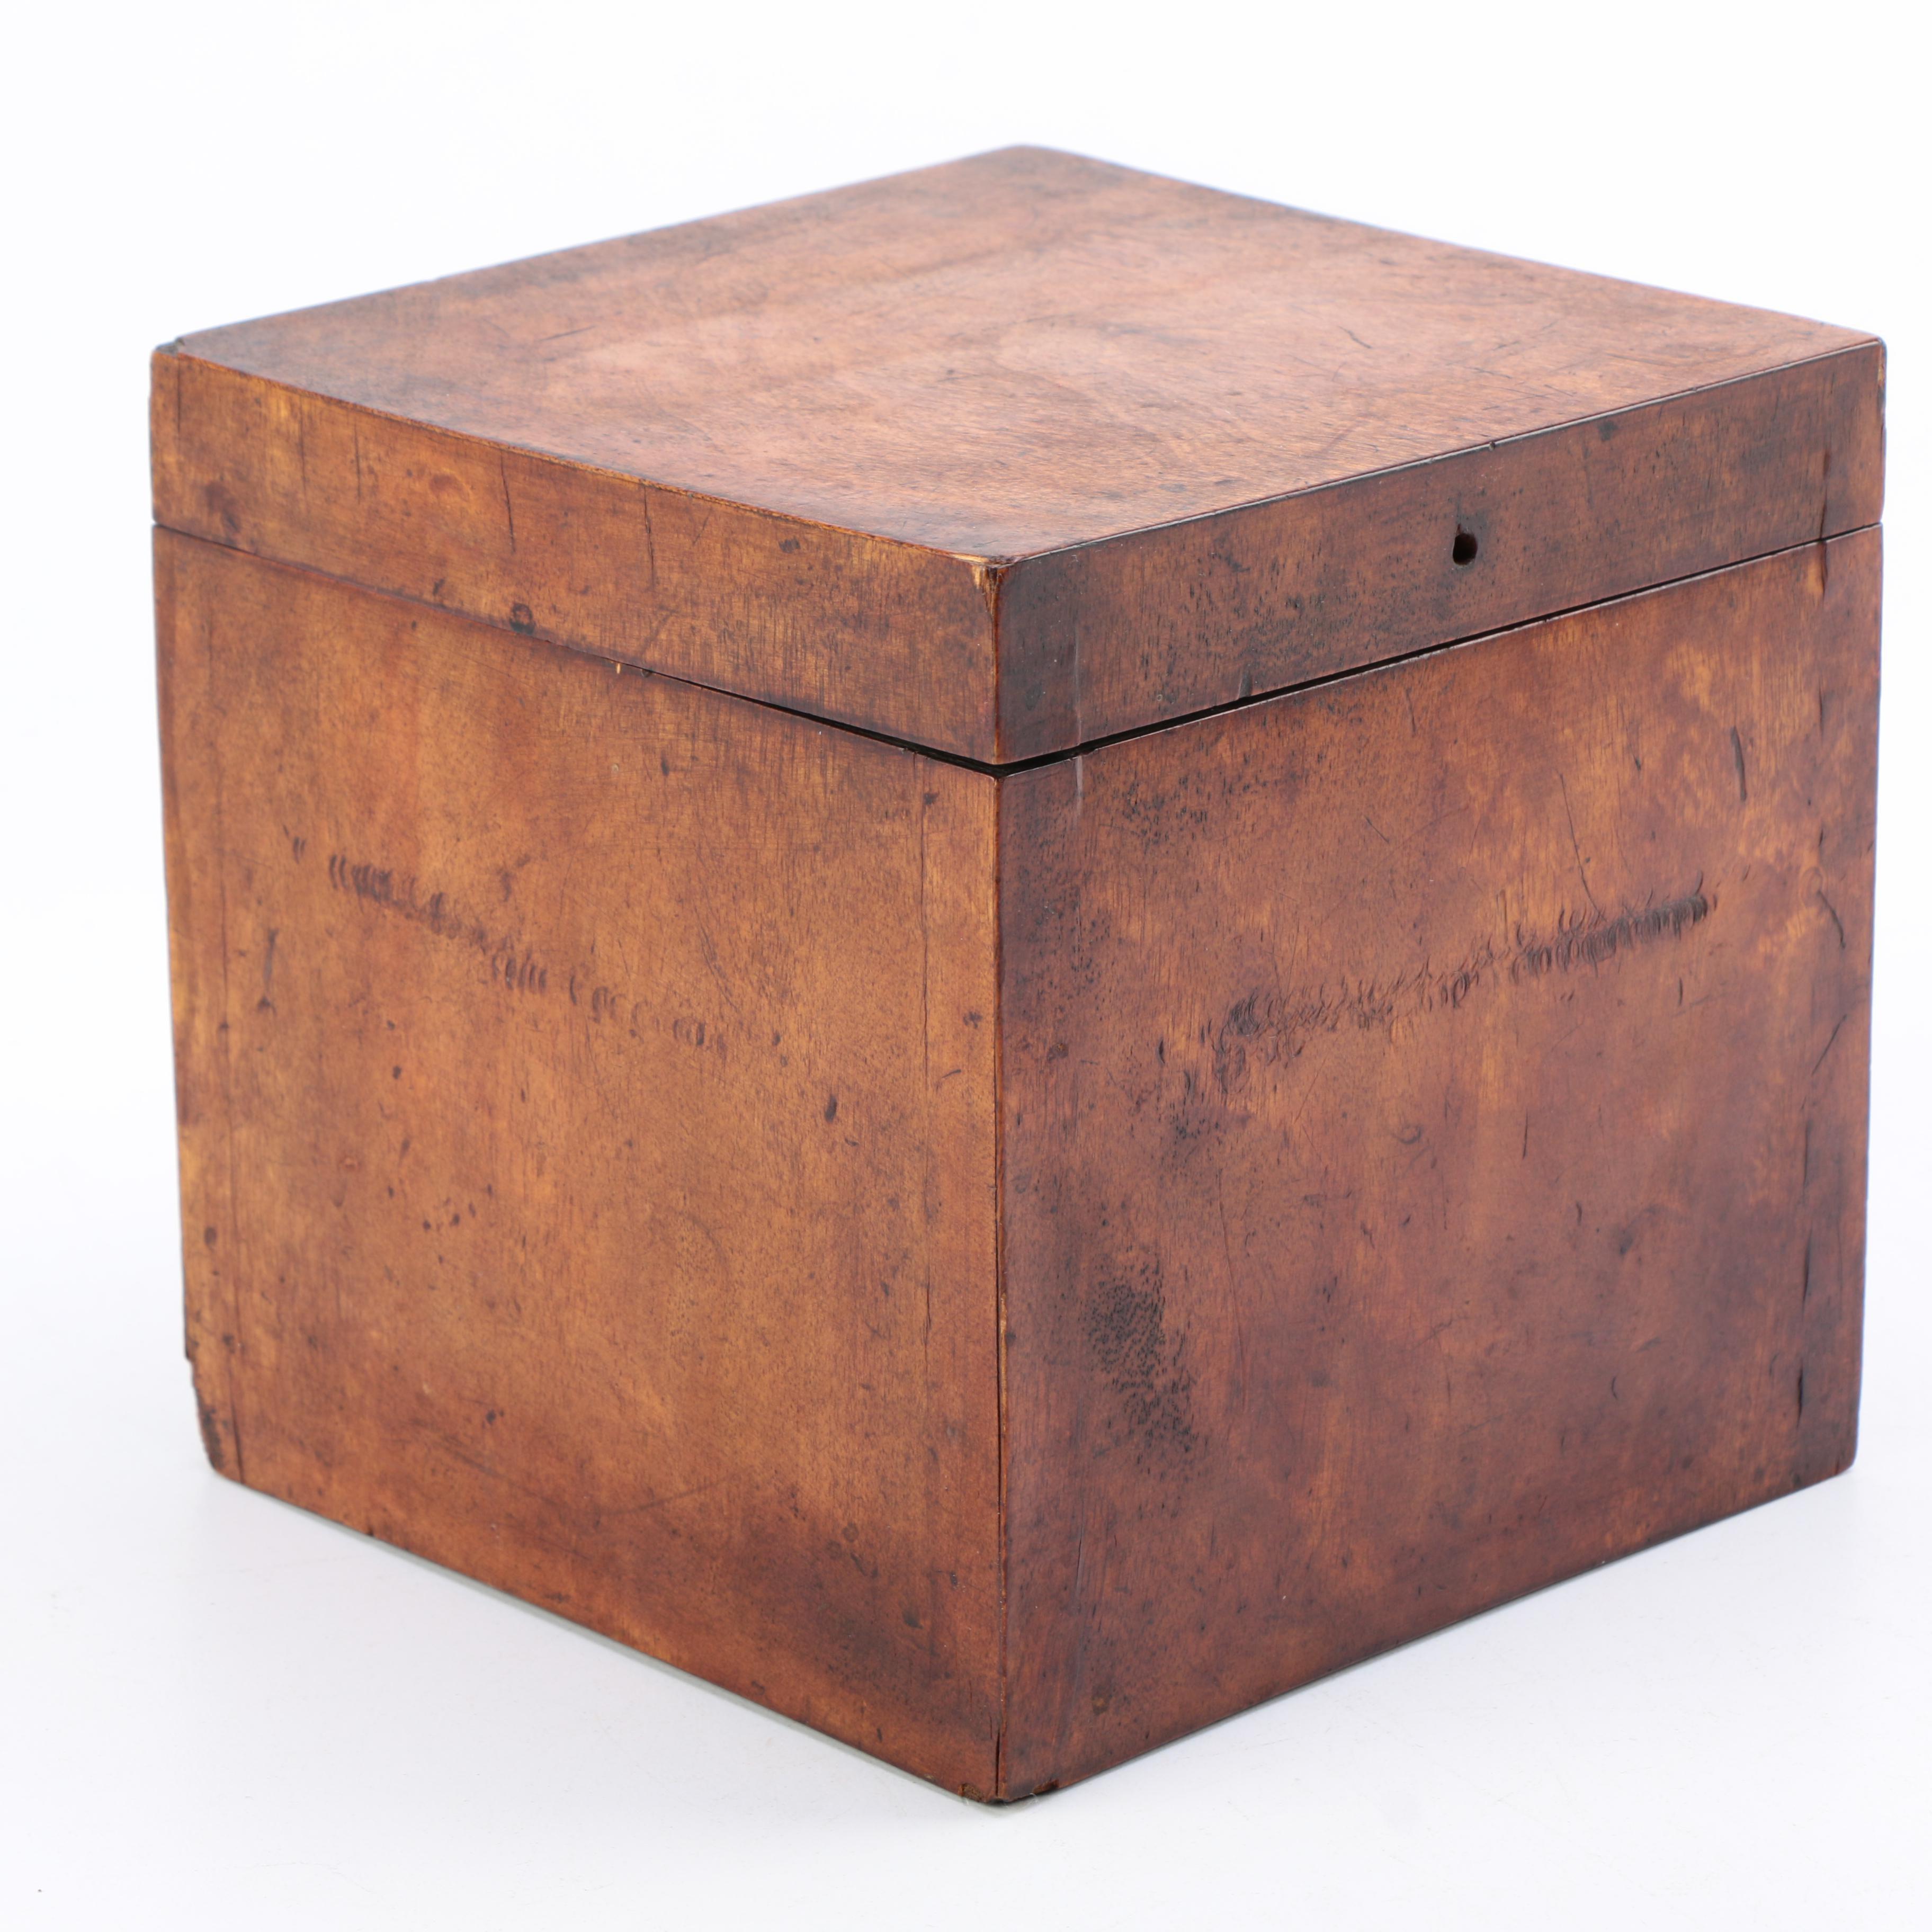 Antique Cube Shaped Walnut Box